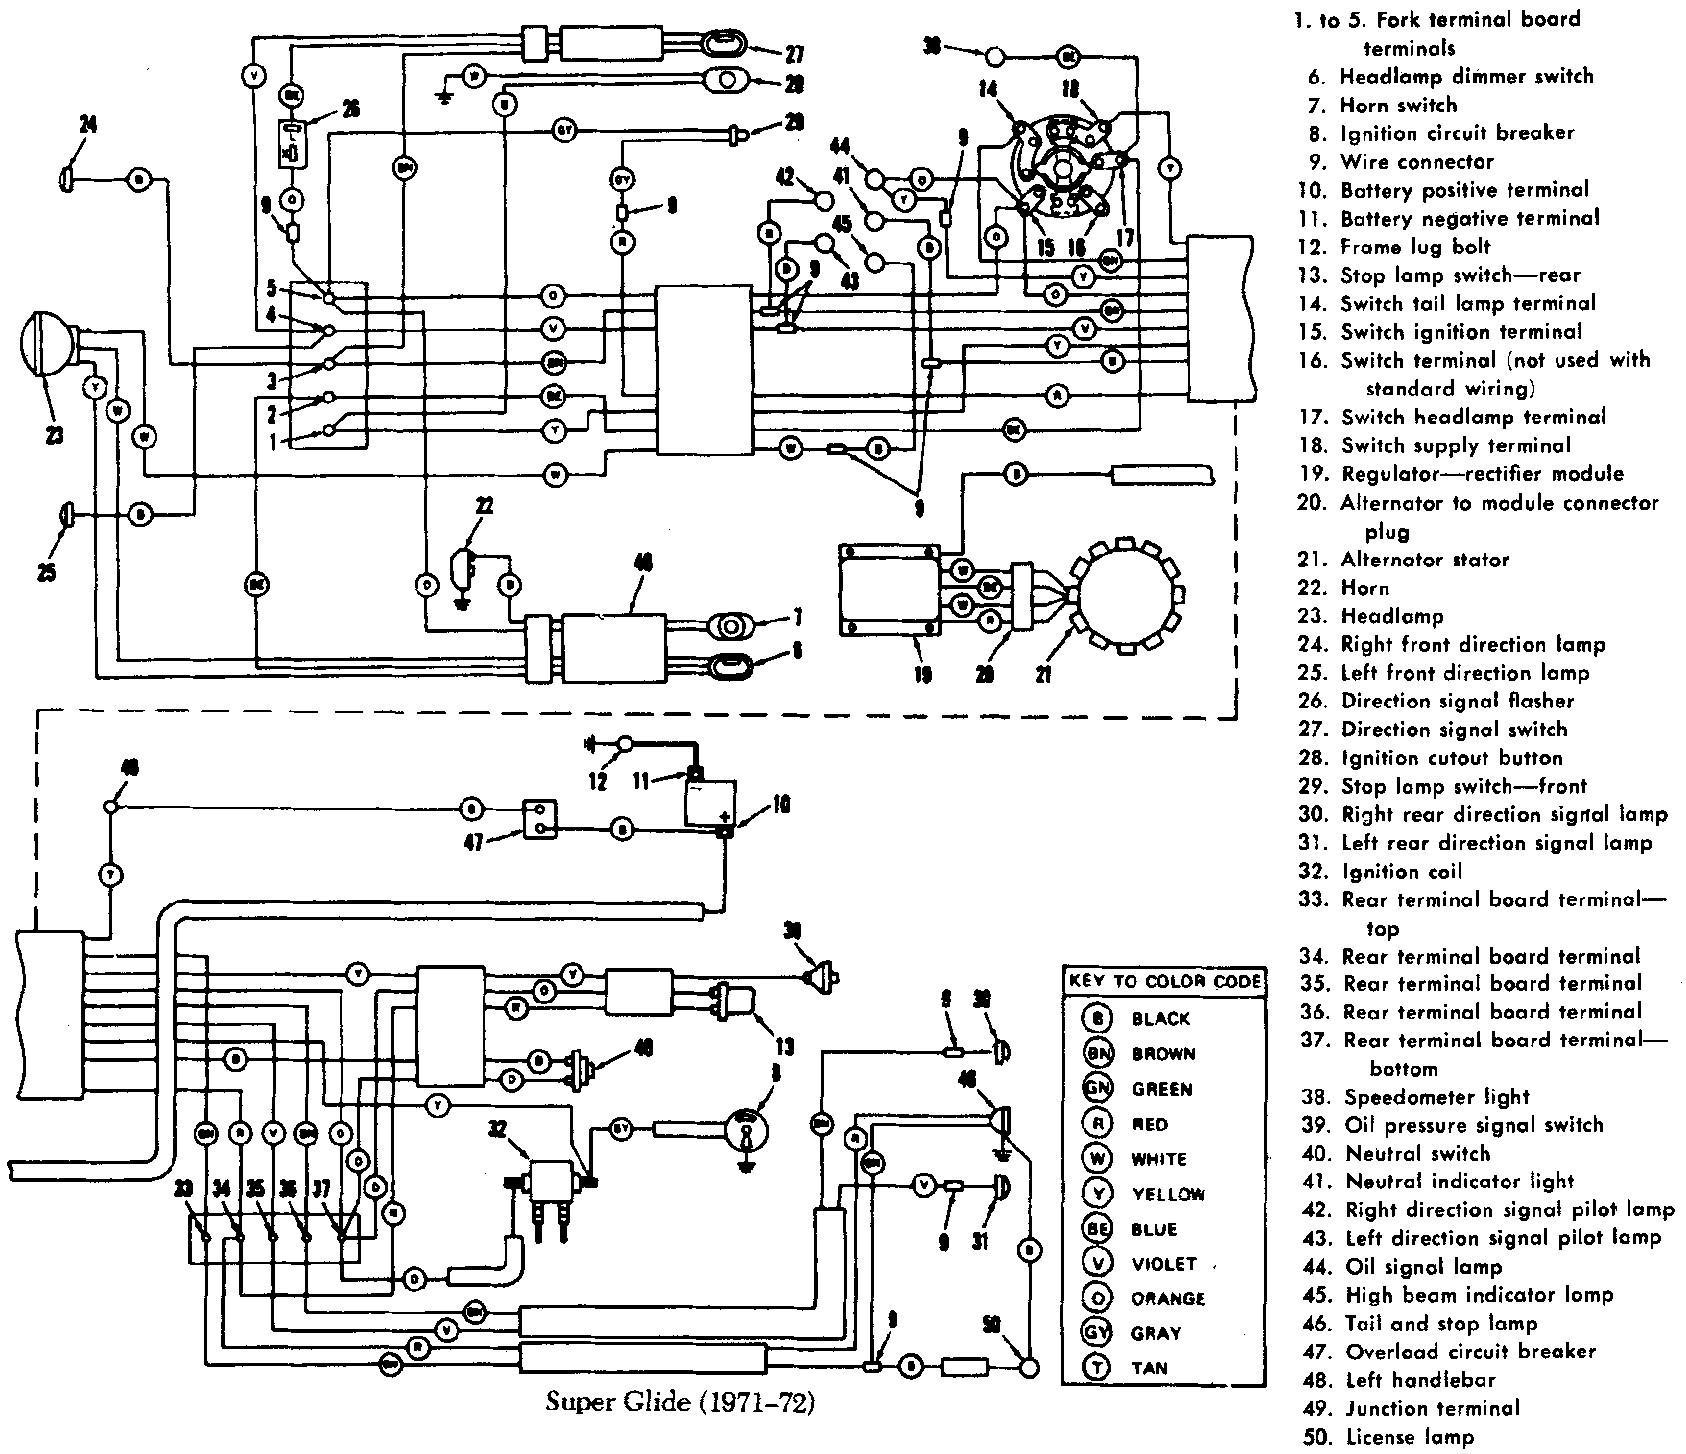 Harley Davidson Coil Wiring Diagram Awesome Harley Davidson Wiring Diagram Download Stylesync Me Amazing Blurts